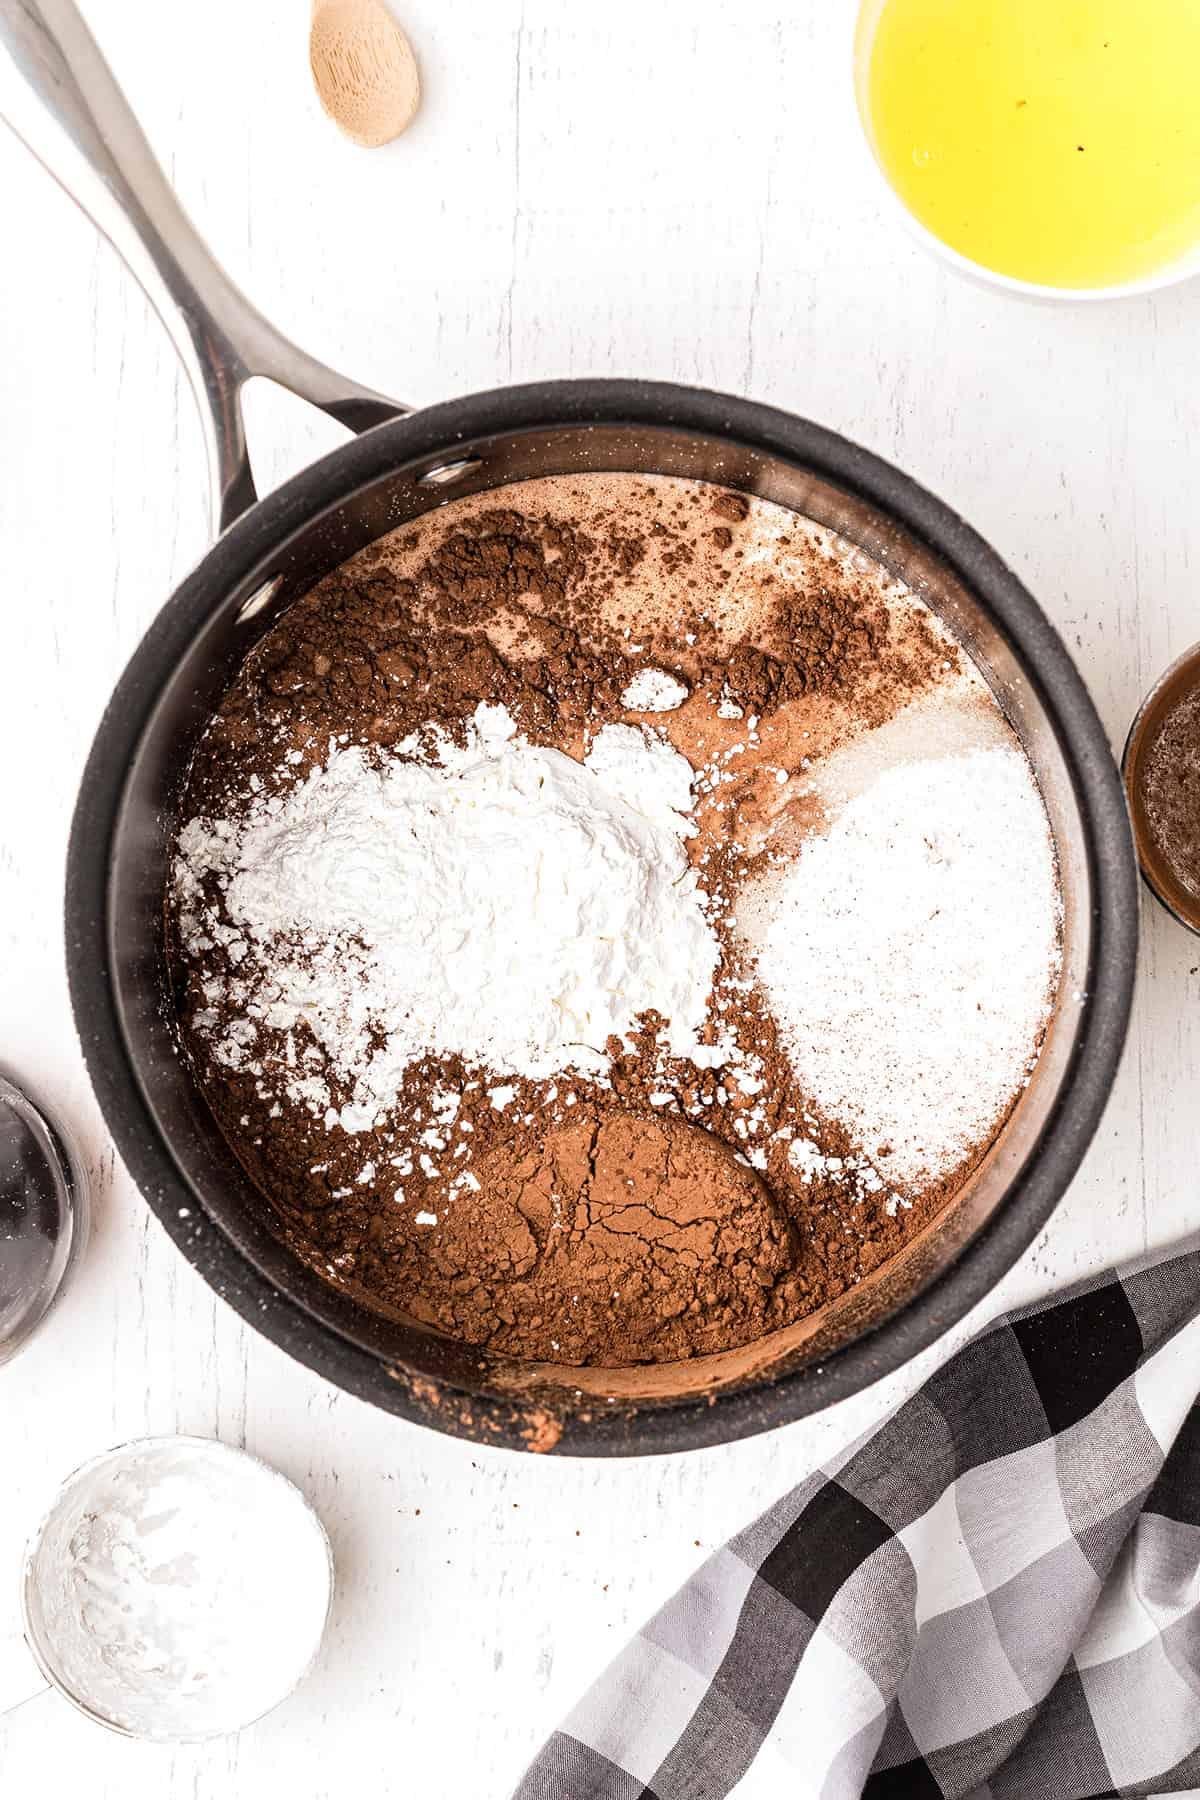 Medium saucepan with sugar, cocoa, salt and cornstarch.